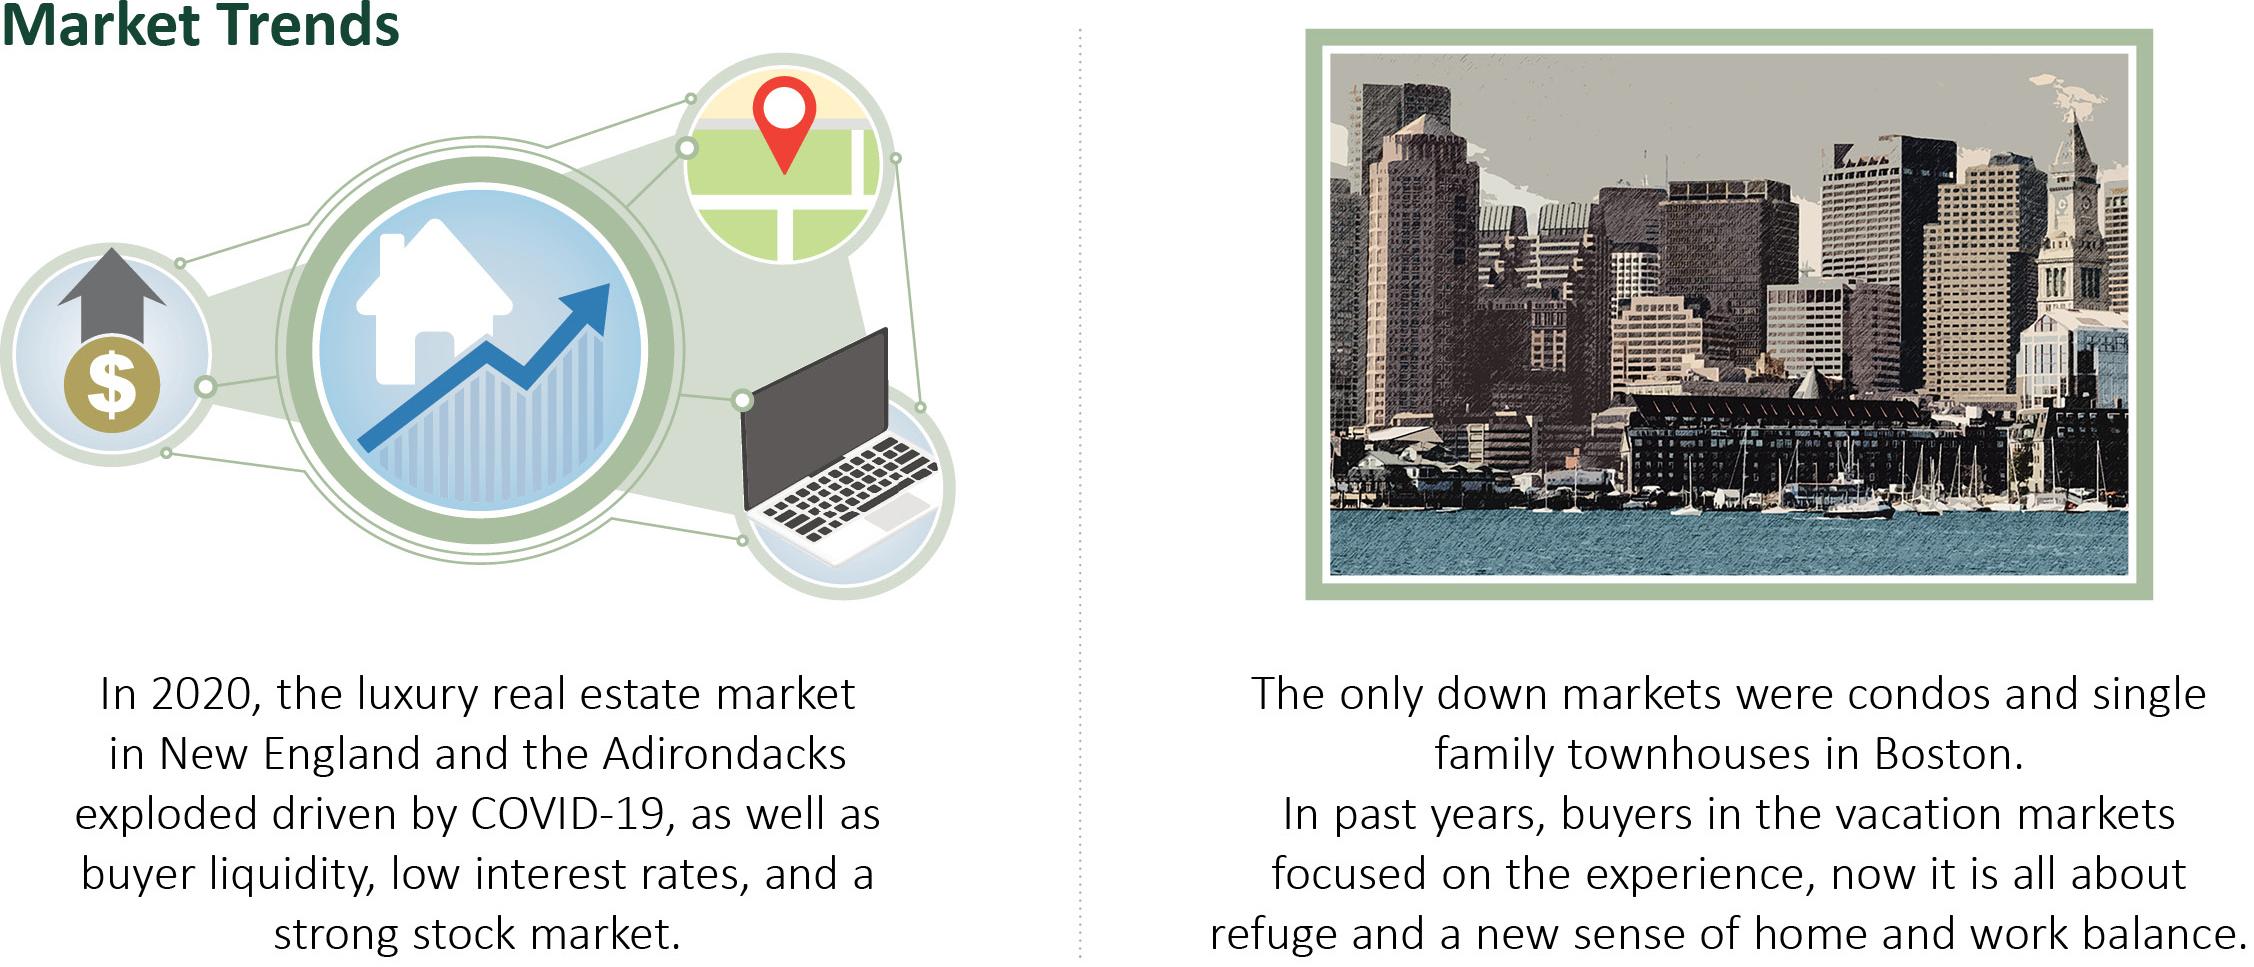 Market Trends, Graphic